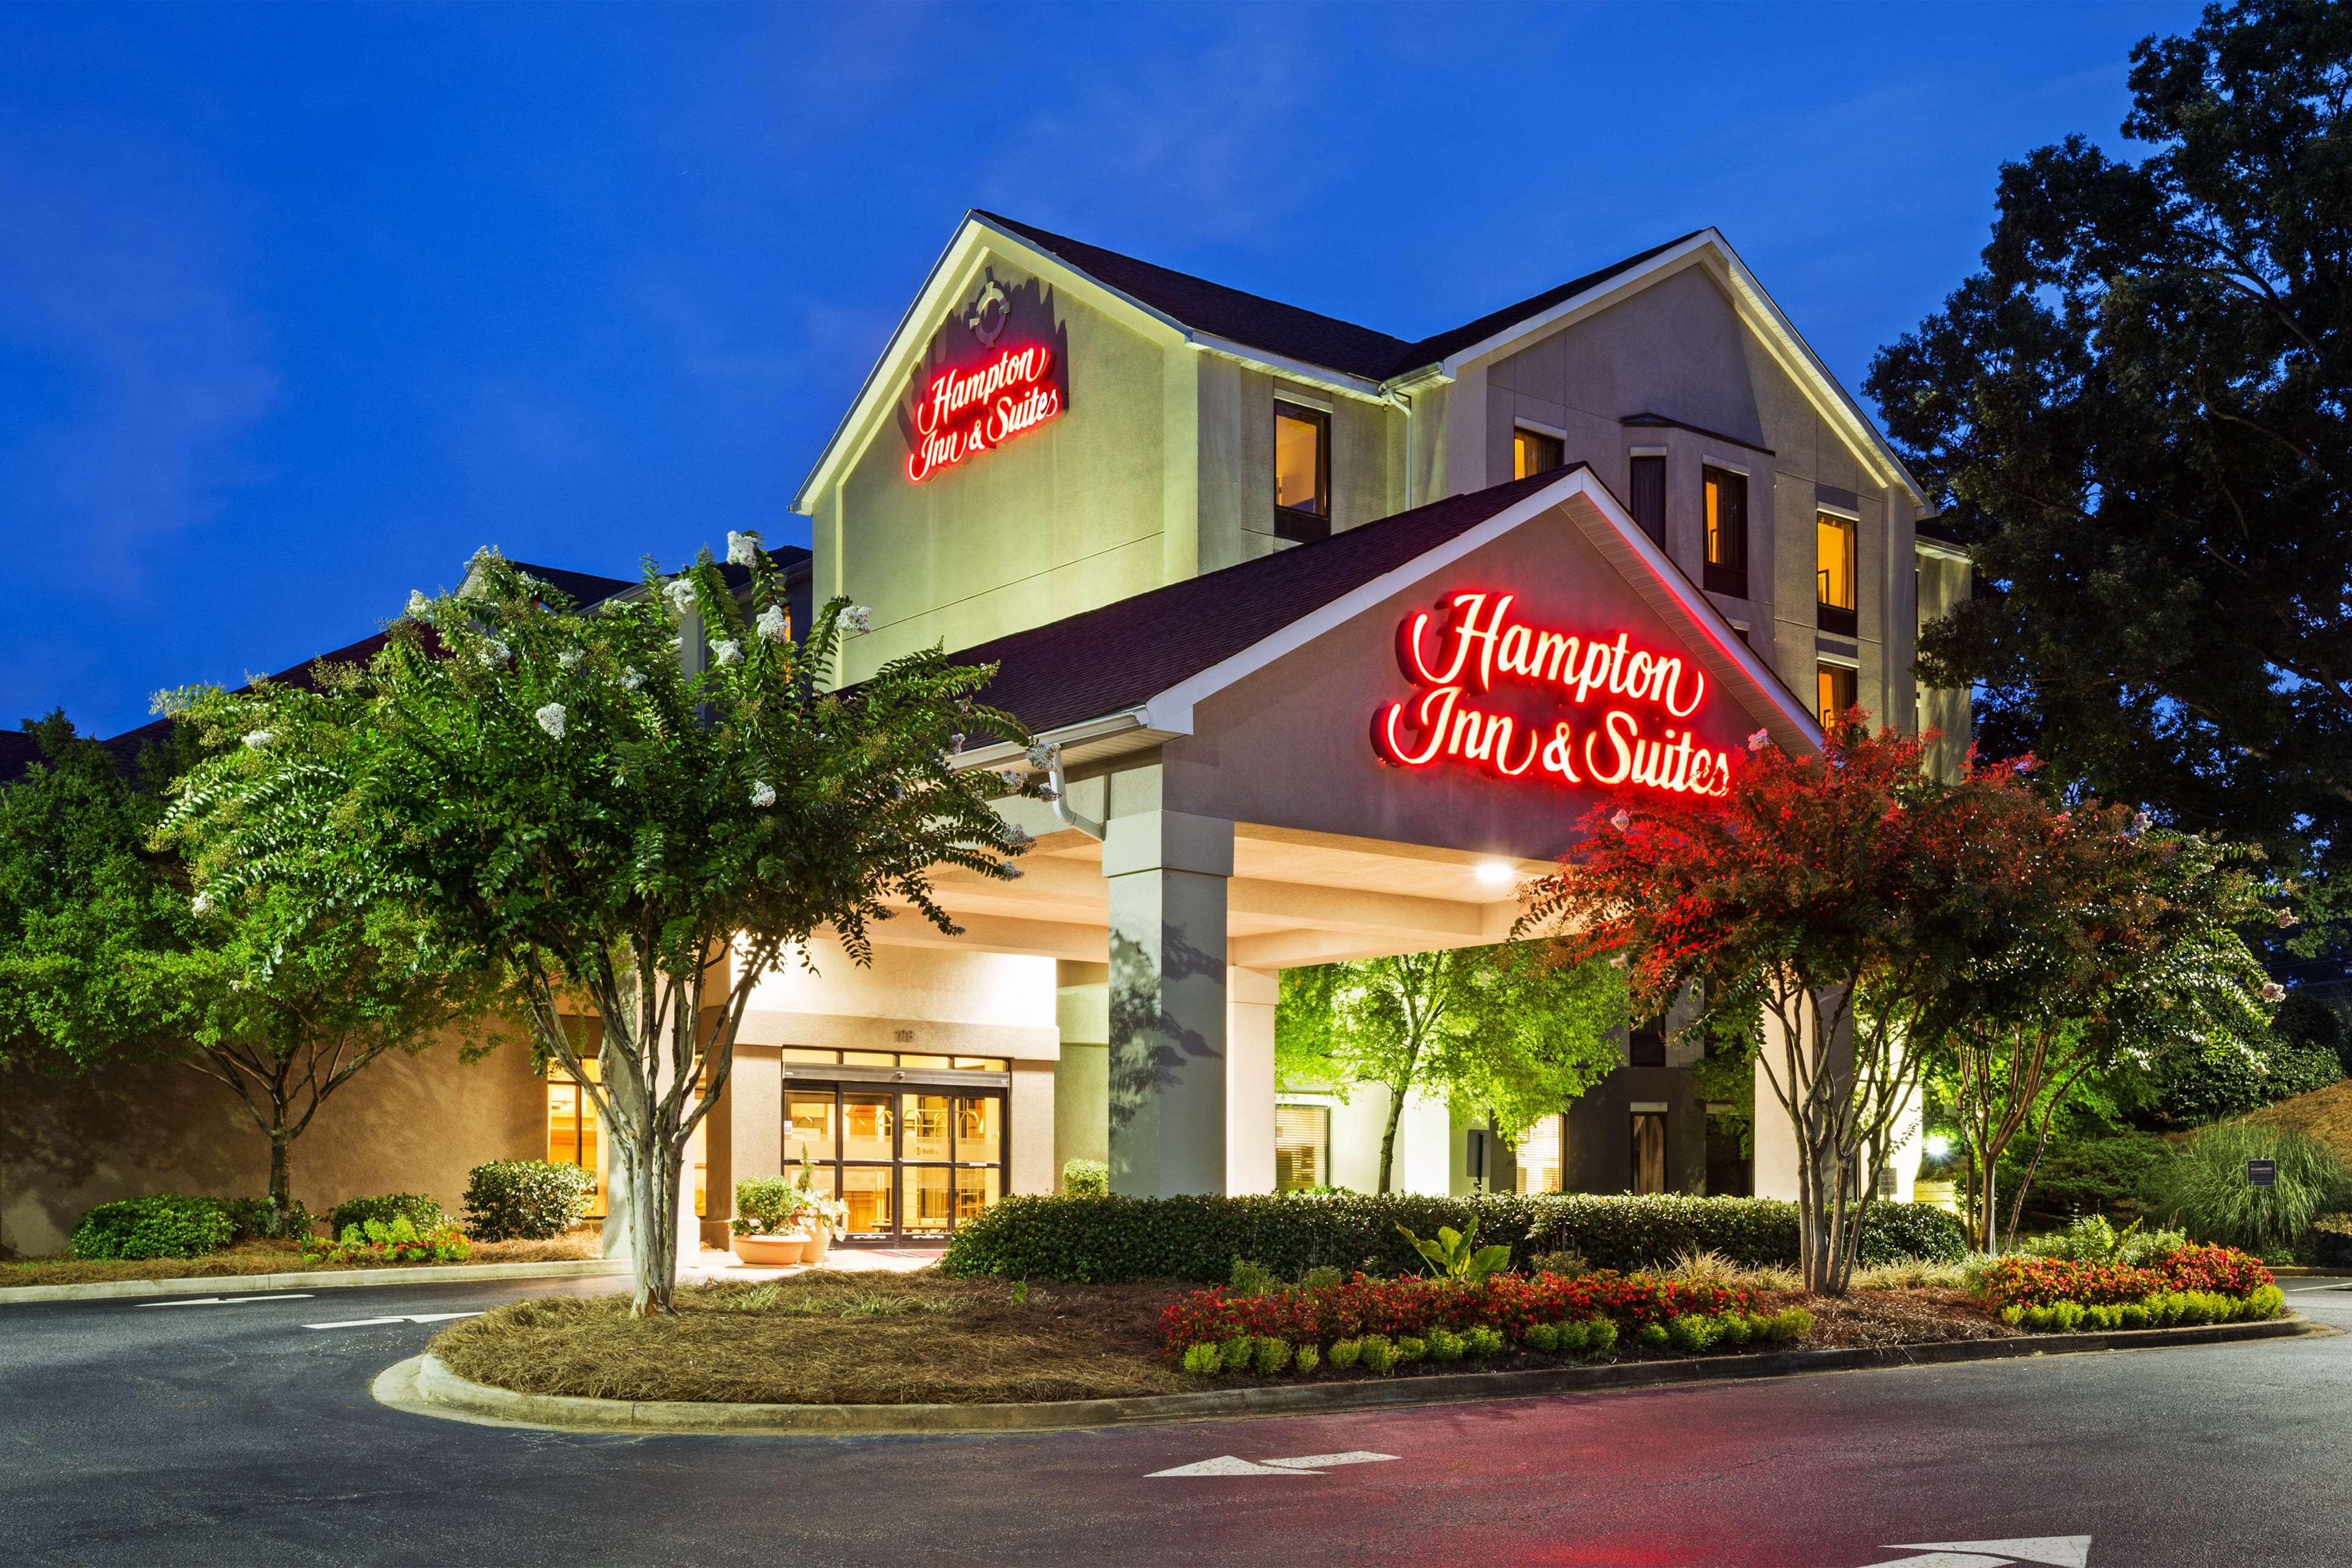 Hampton Inn & Suites Greenville/Spartanburg I-85 image 2